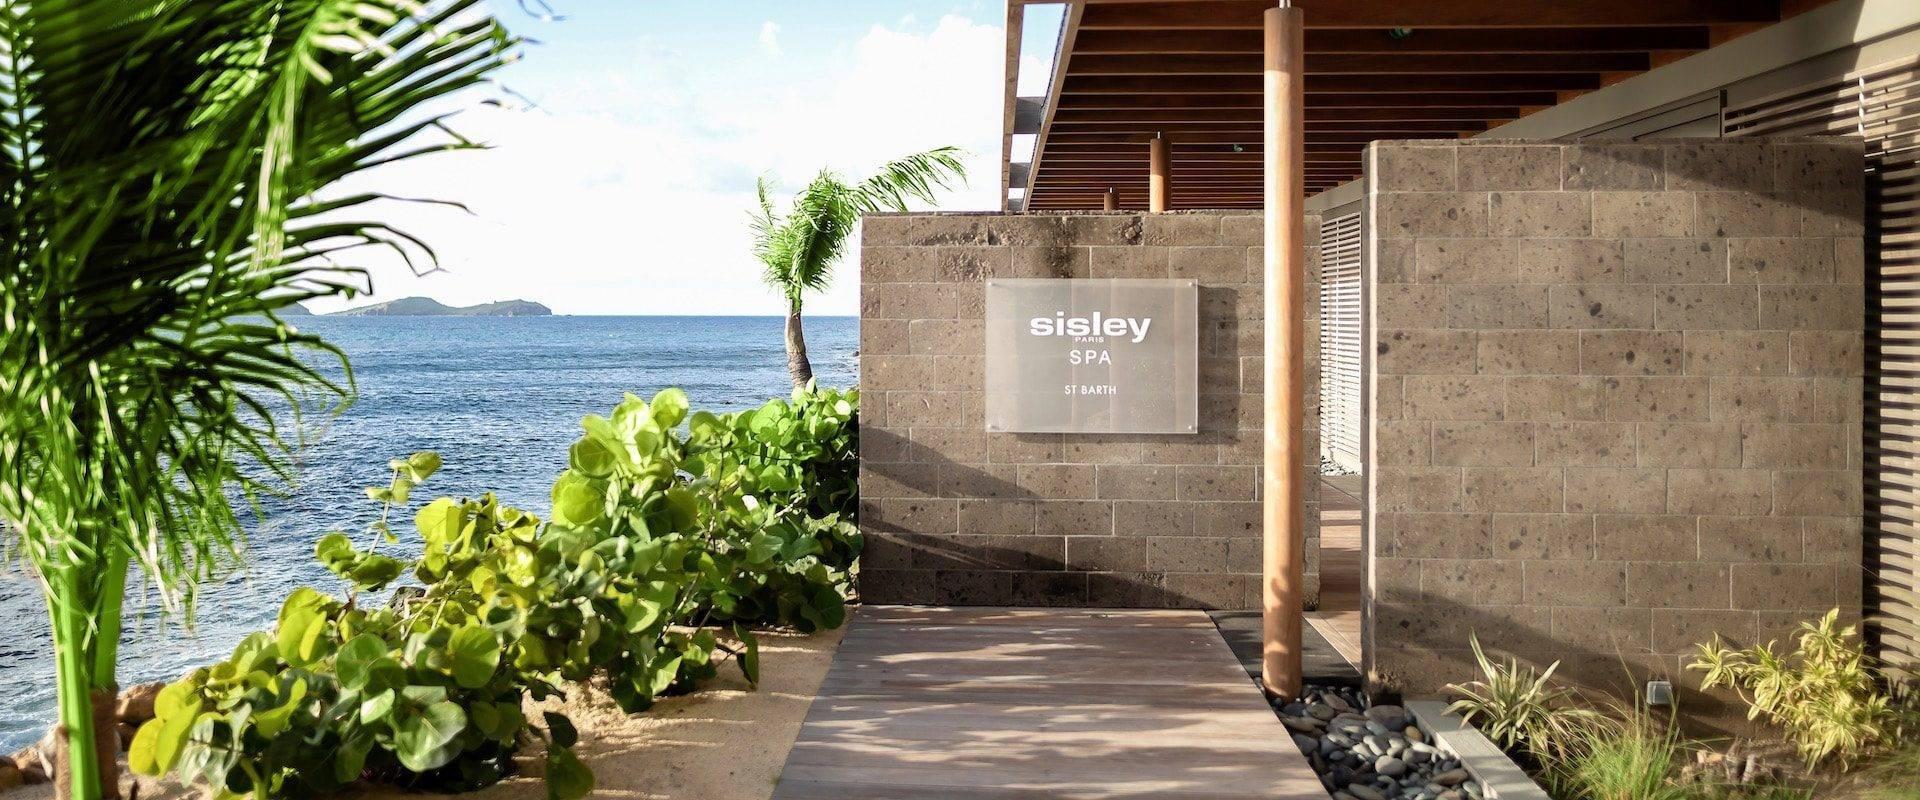 1-sisley-spa-st-barth